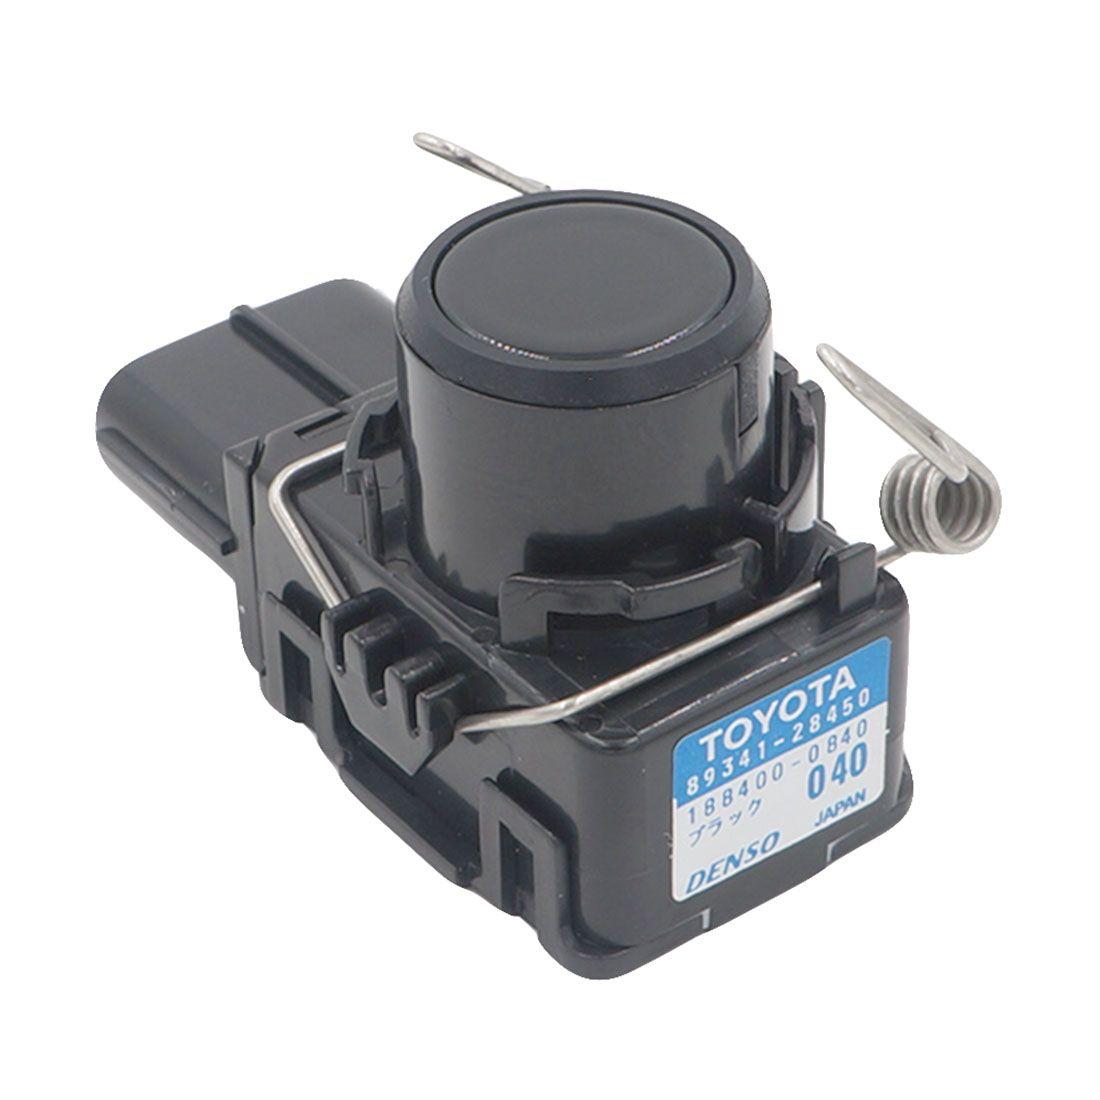 New Car Sensor 89341-28450-C0 PDC Sensore di Parcheggio Toyota Land Cruiser Lexus LX570 08-11